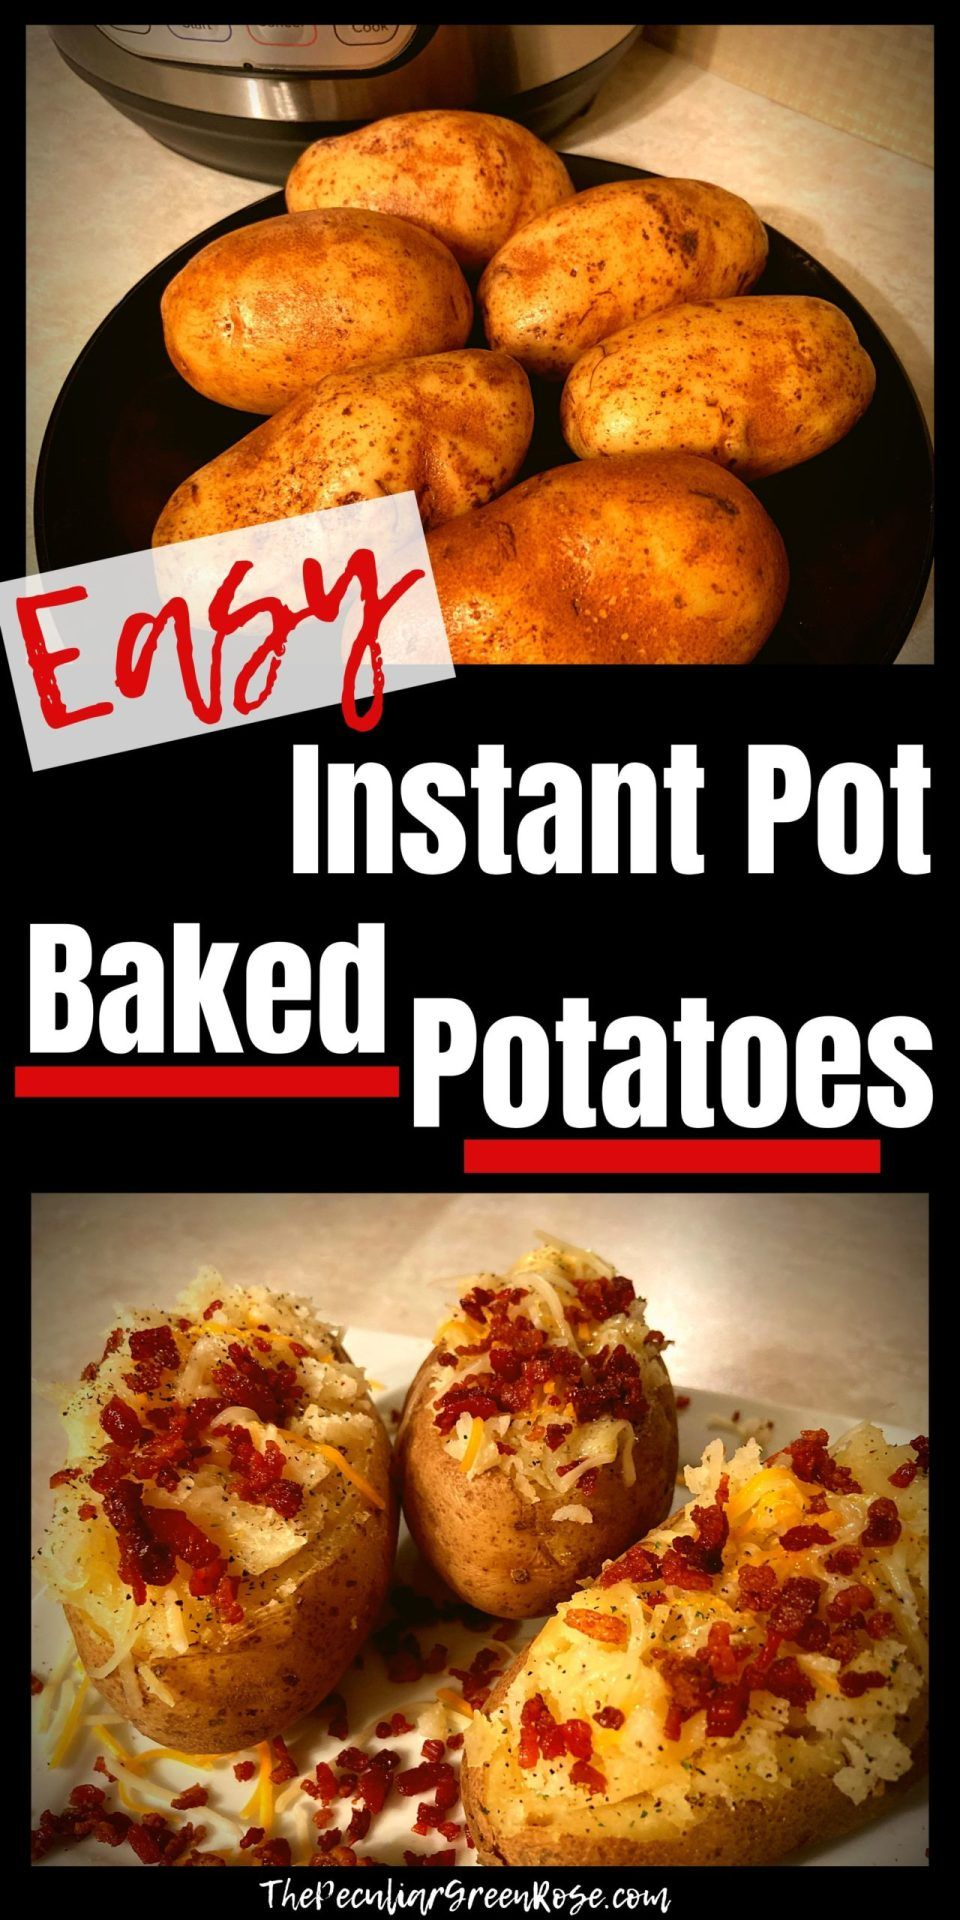 Instant Pot Baked Potatoes Recipe Baked Potato Recipes Potato Recipes Easy Instant Pot Recipes